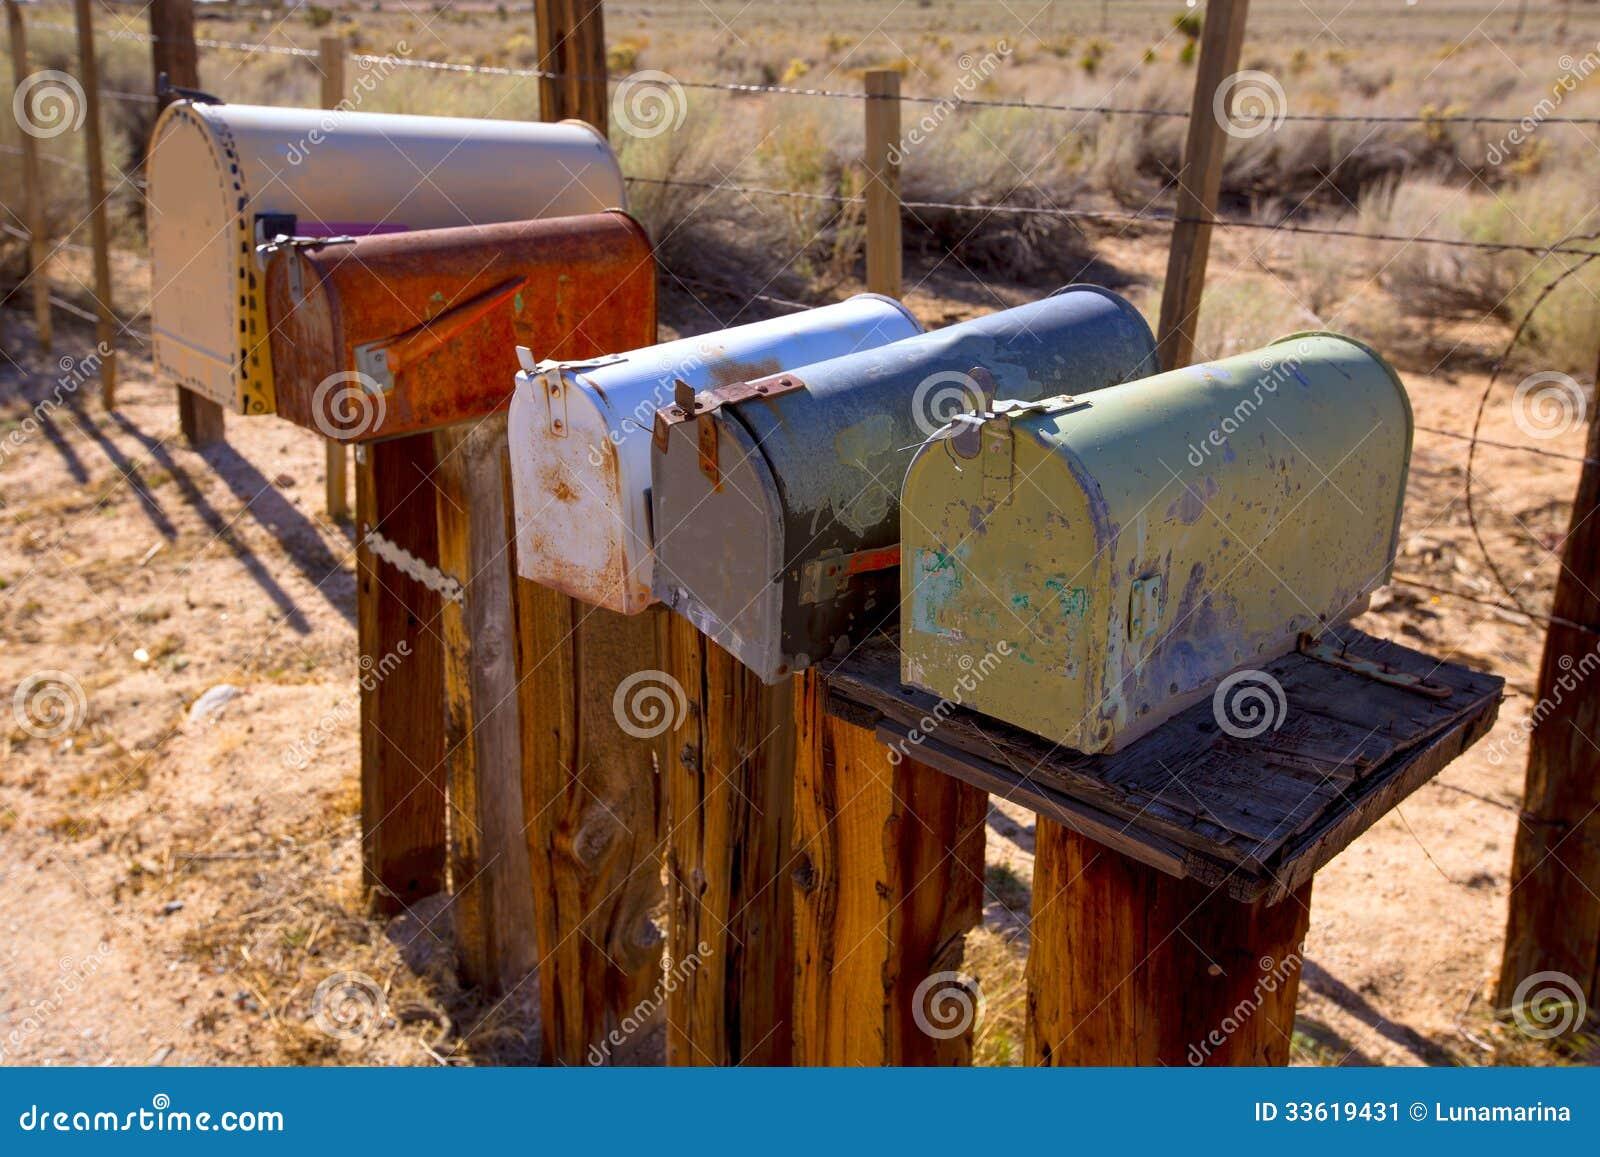 mailboxes aged vintage in west california desert stock image image 33619431. Black Bedroom Furniture Sets. Home Design Ideas